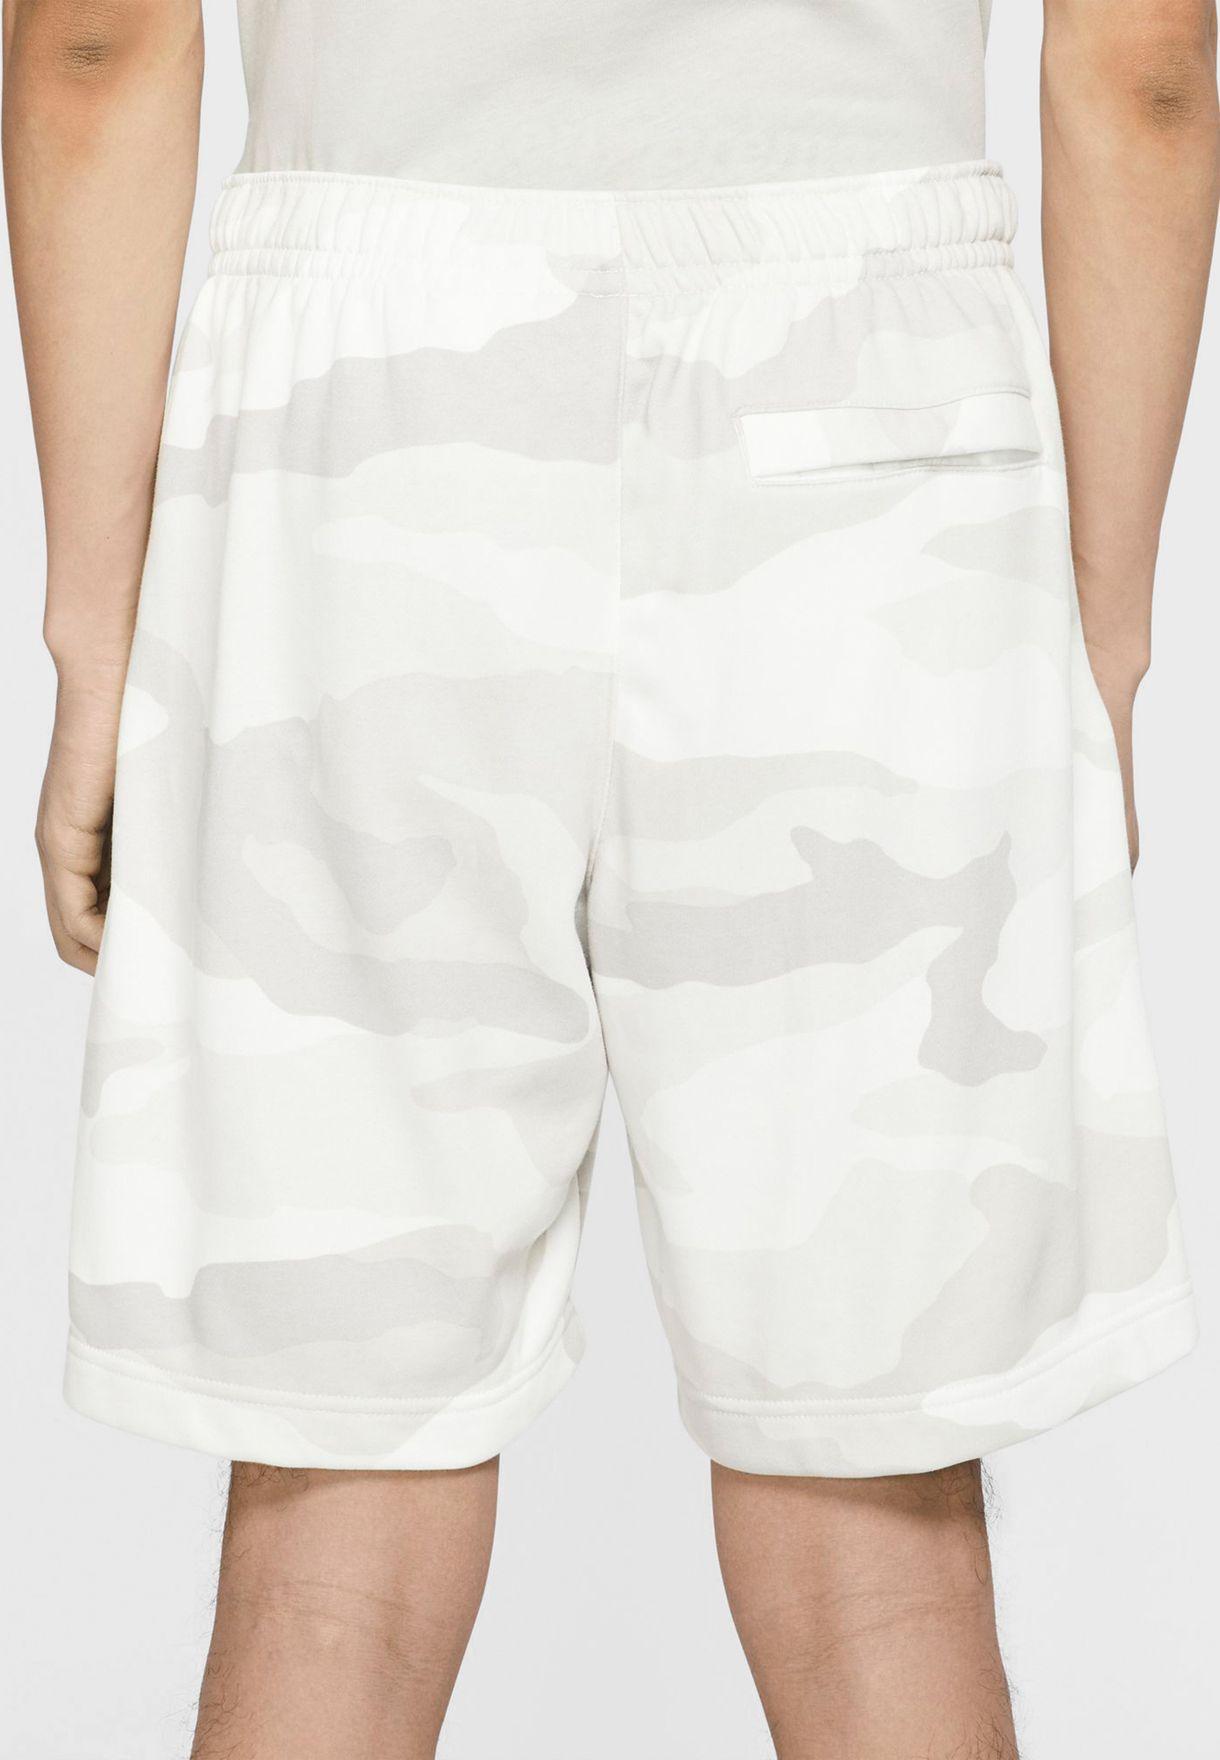 NSW Club Camo Shorts